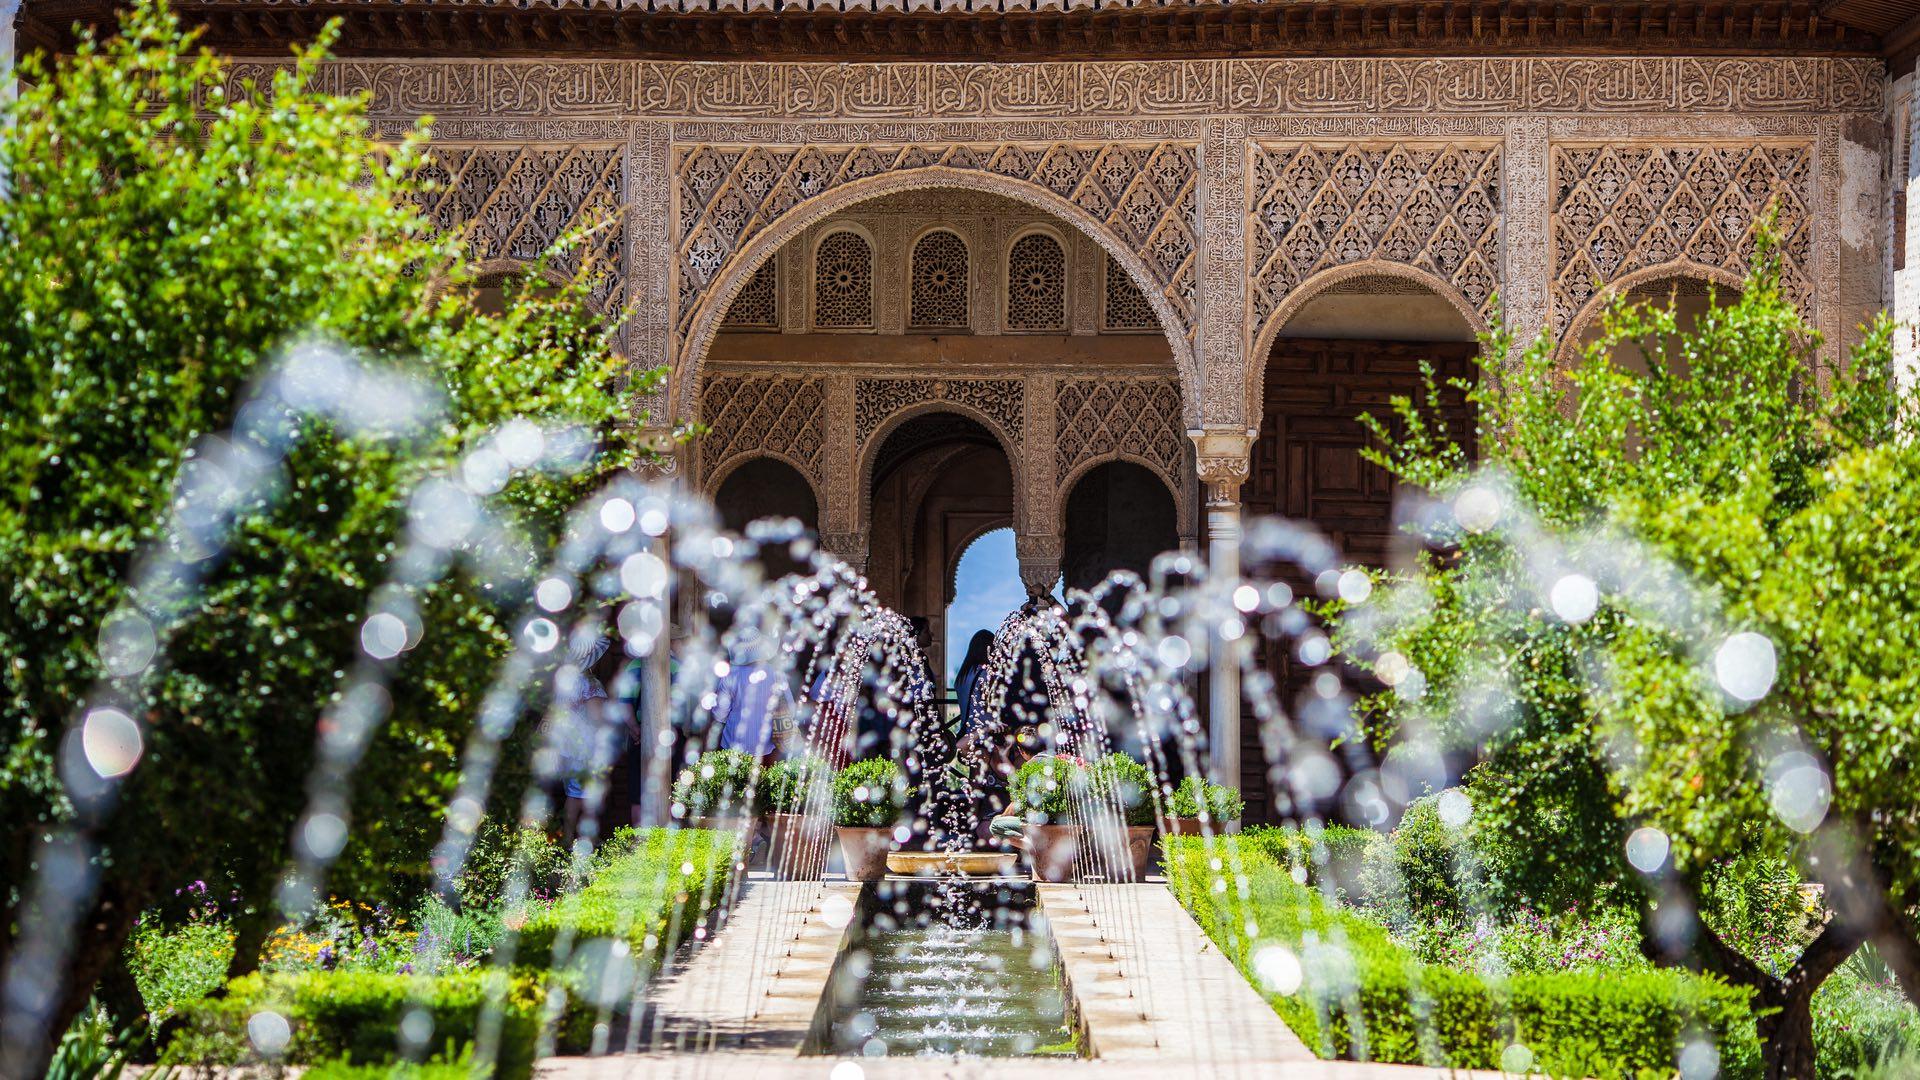 Spanien | Alhambra | ©Martchan/Shutterstock.com